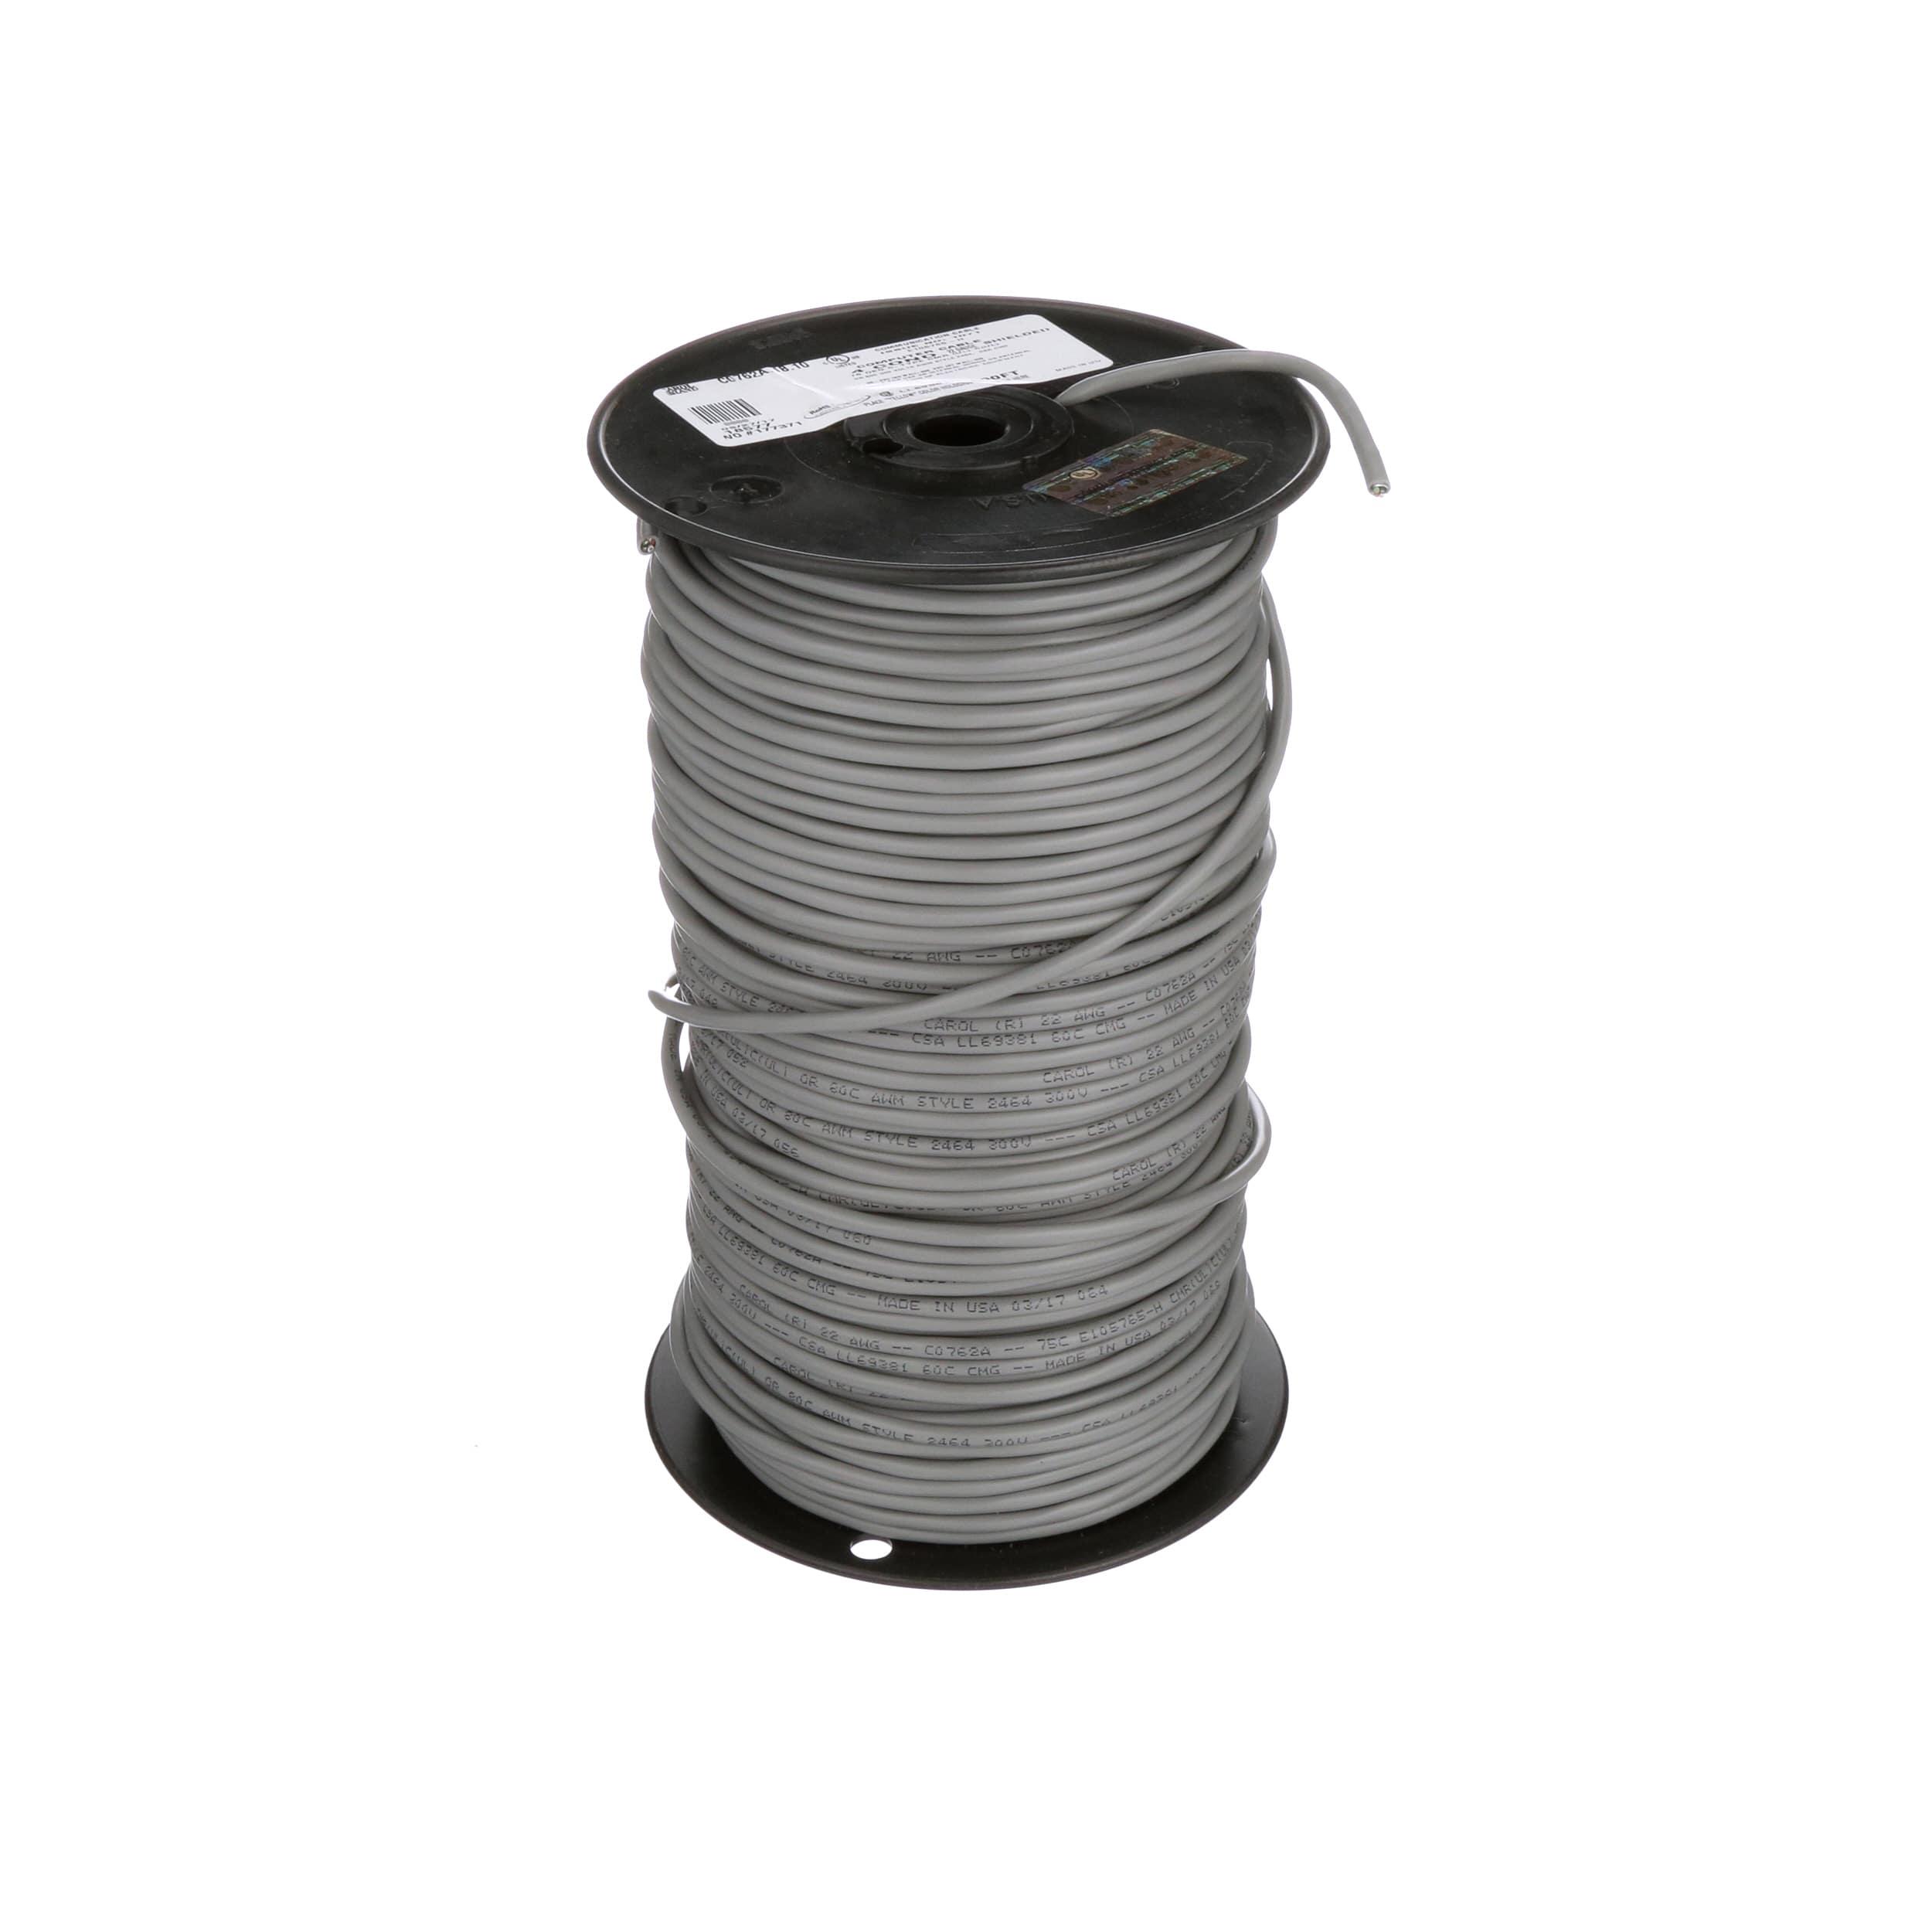 Carol Brand / General Cable - C0762A.18.10 - MULTI-CONDUCTOR; 4COND ...